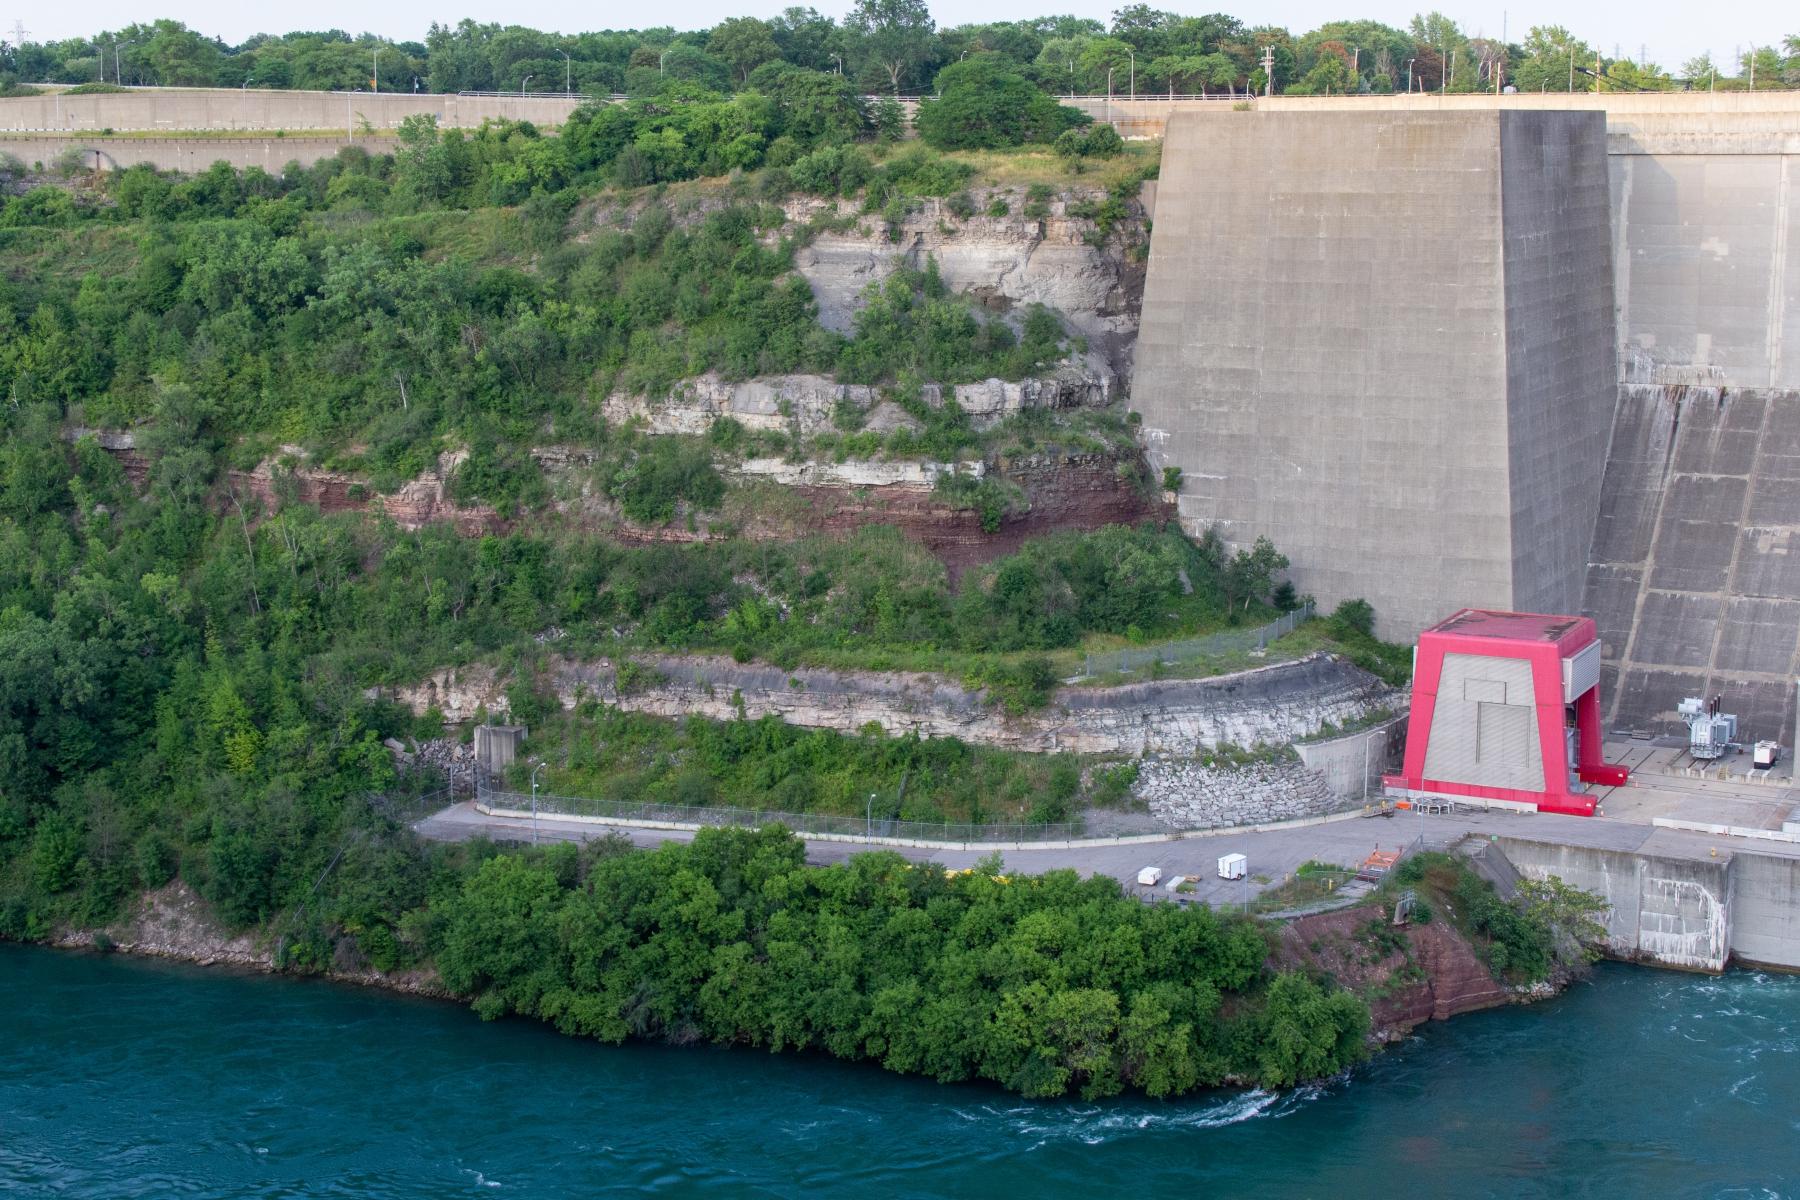 Niagara gorge walls